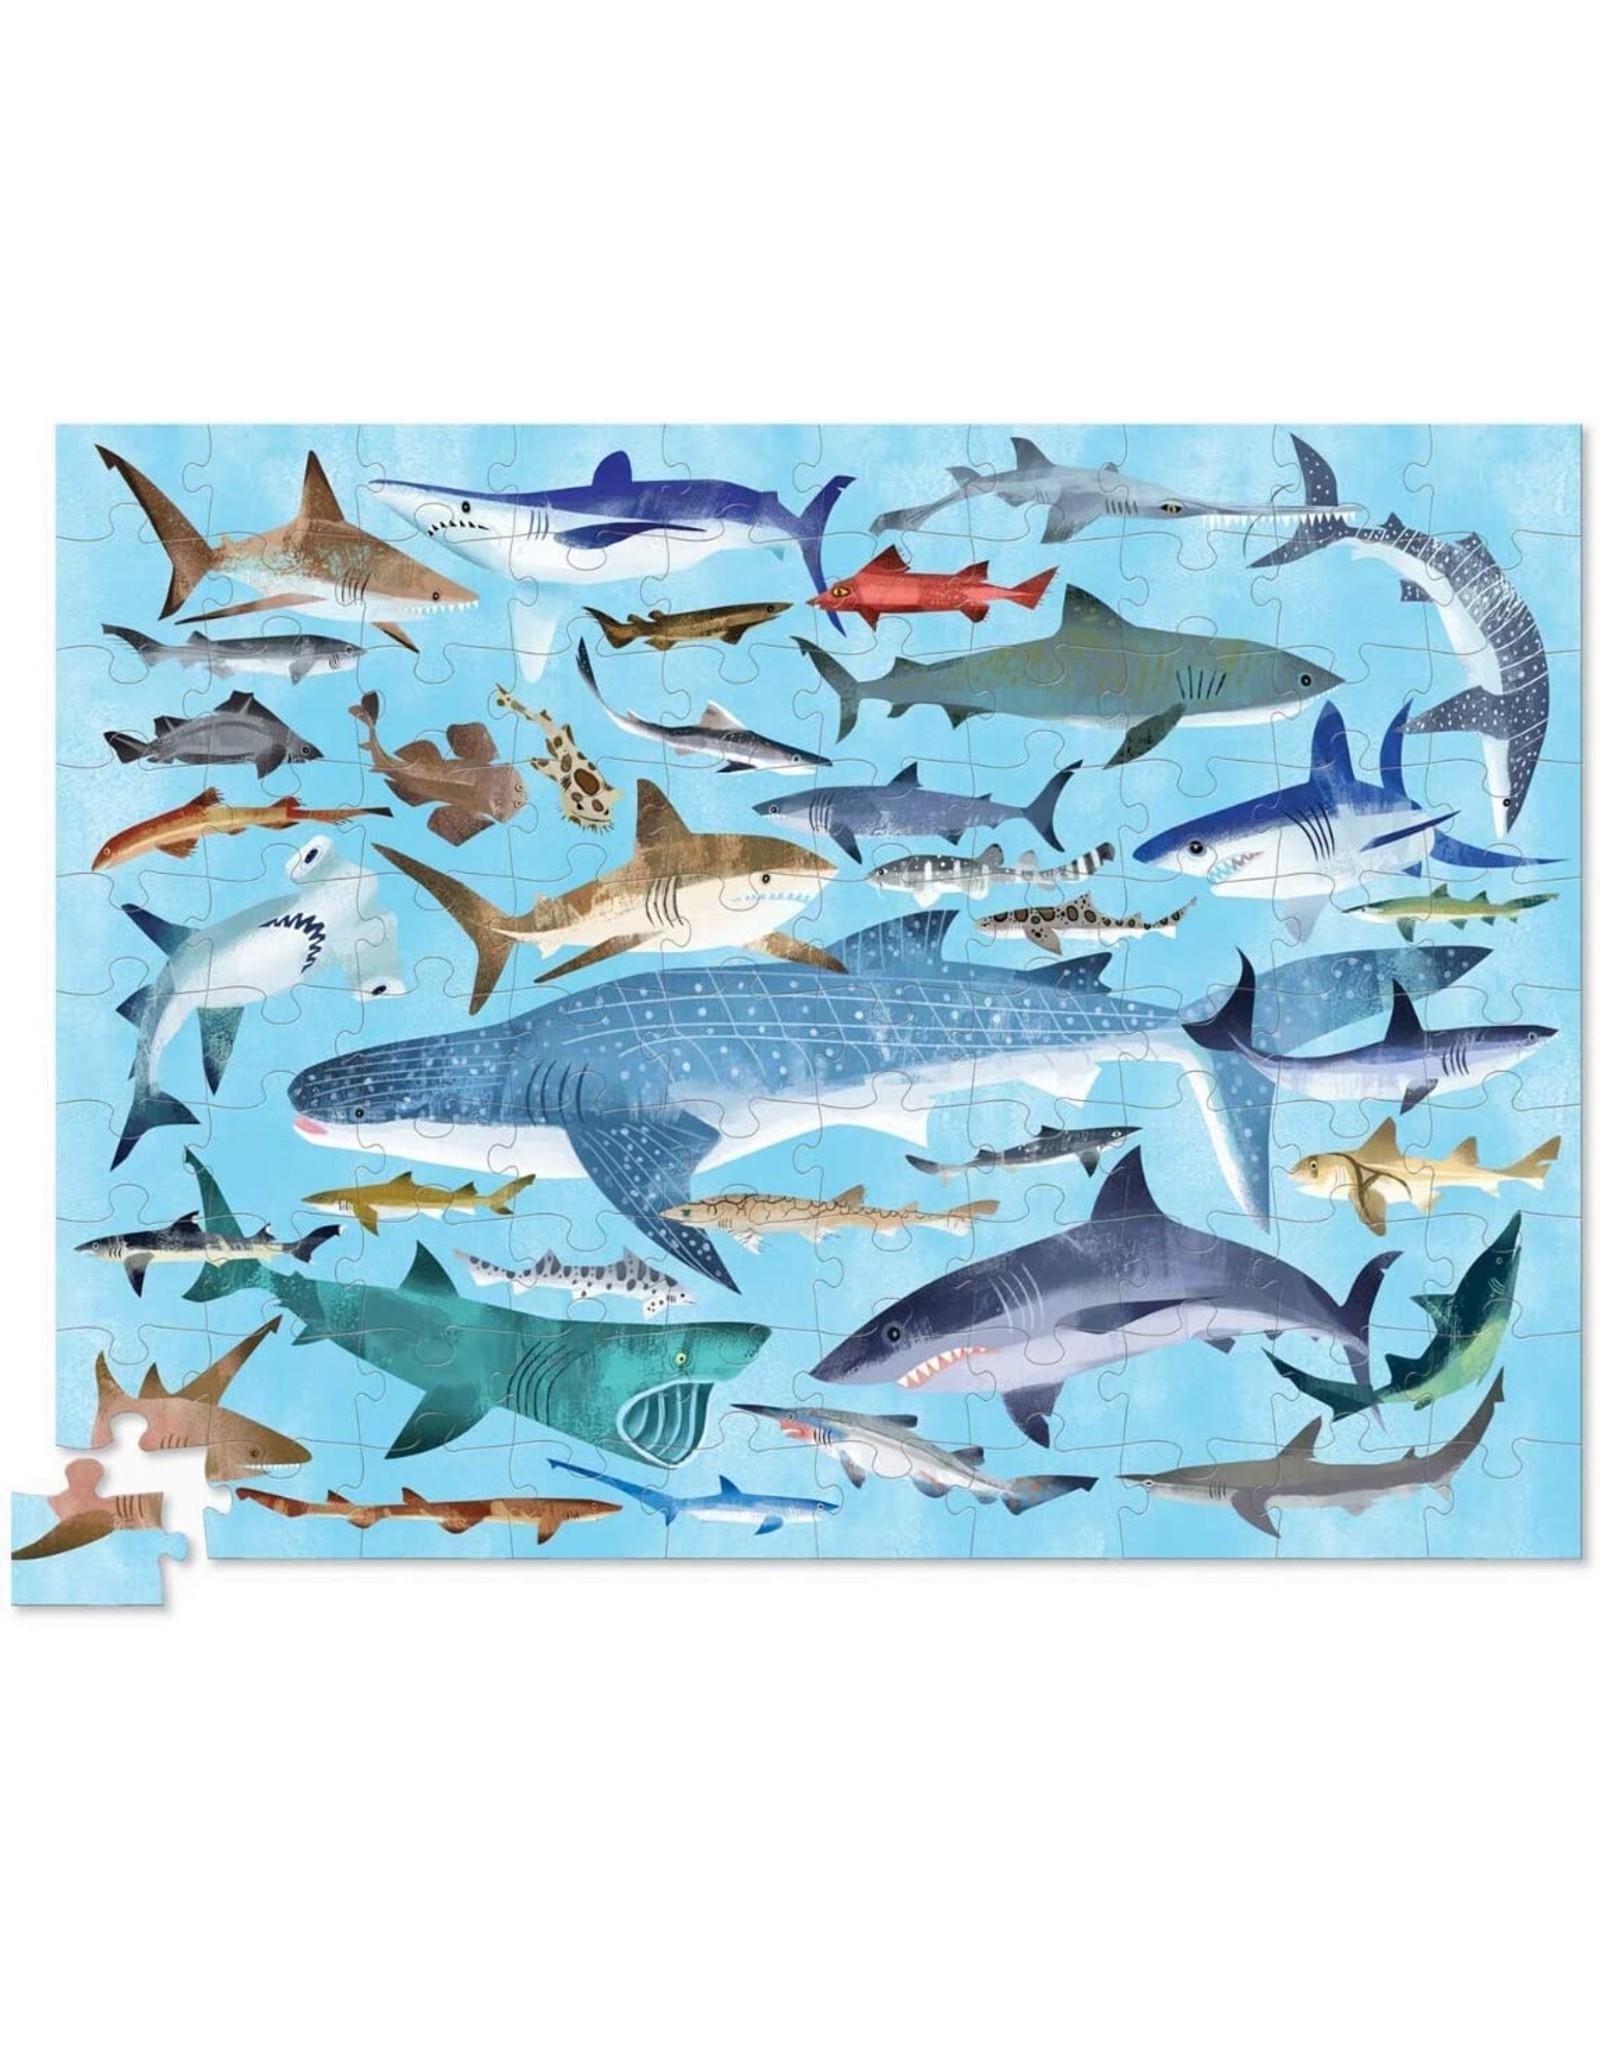 Crocodile Creek 36 Sharks 100pc